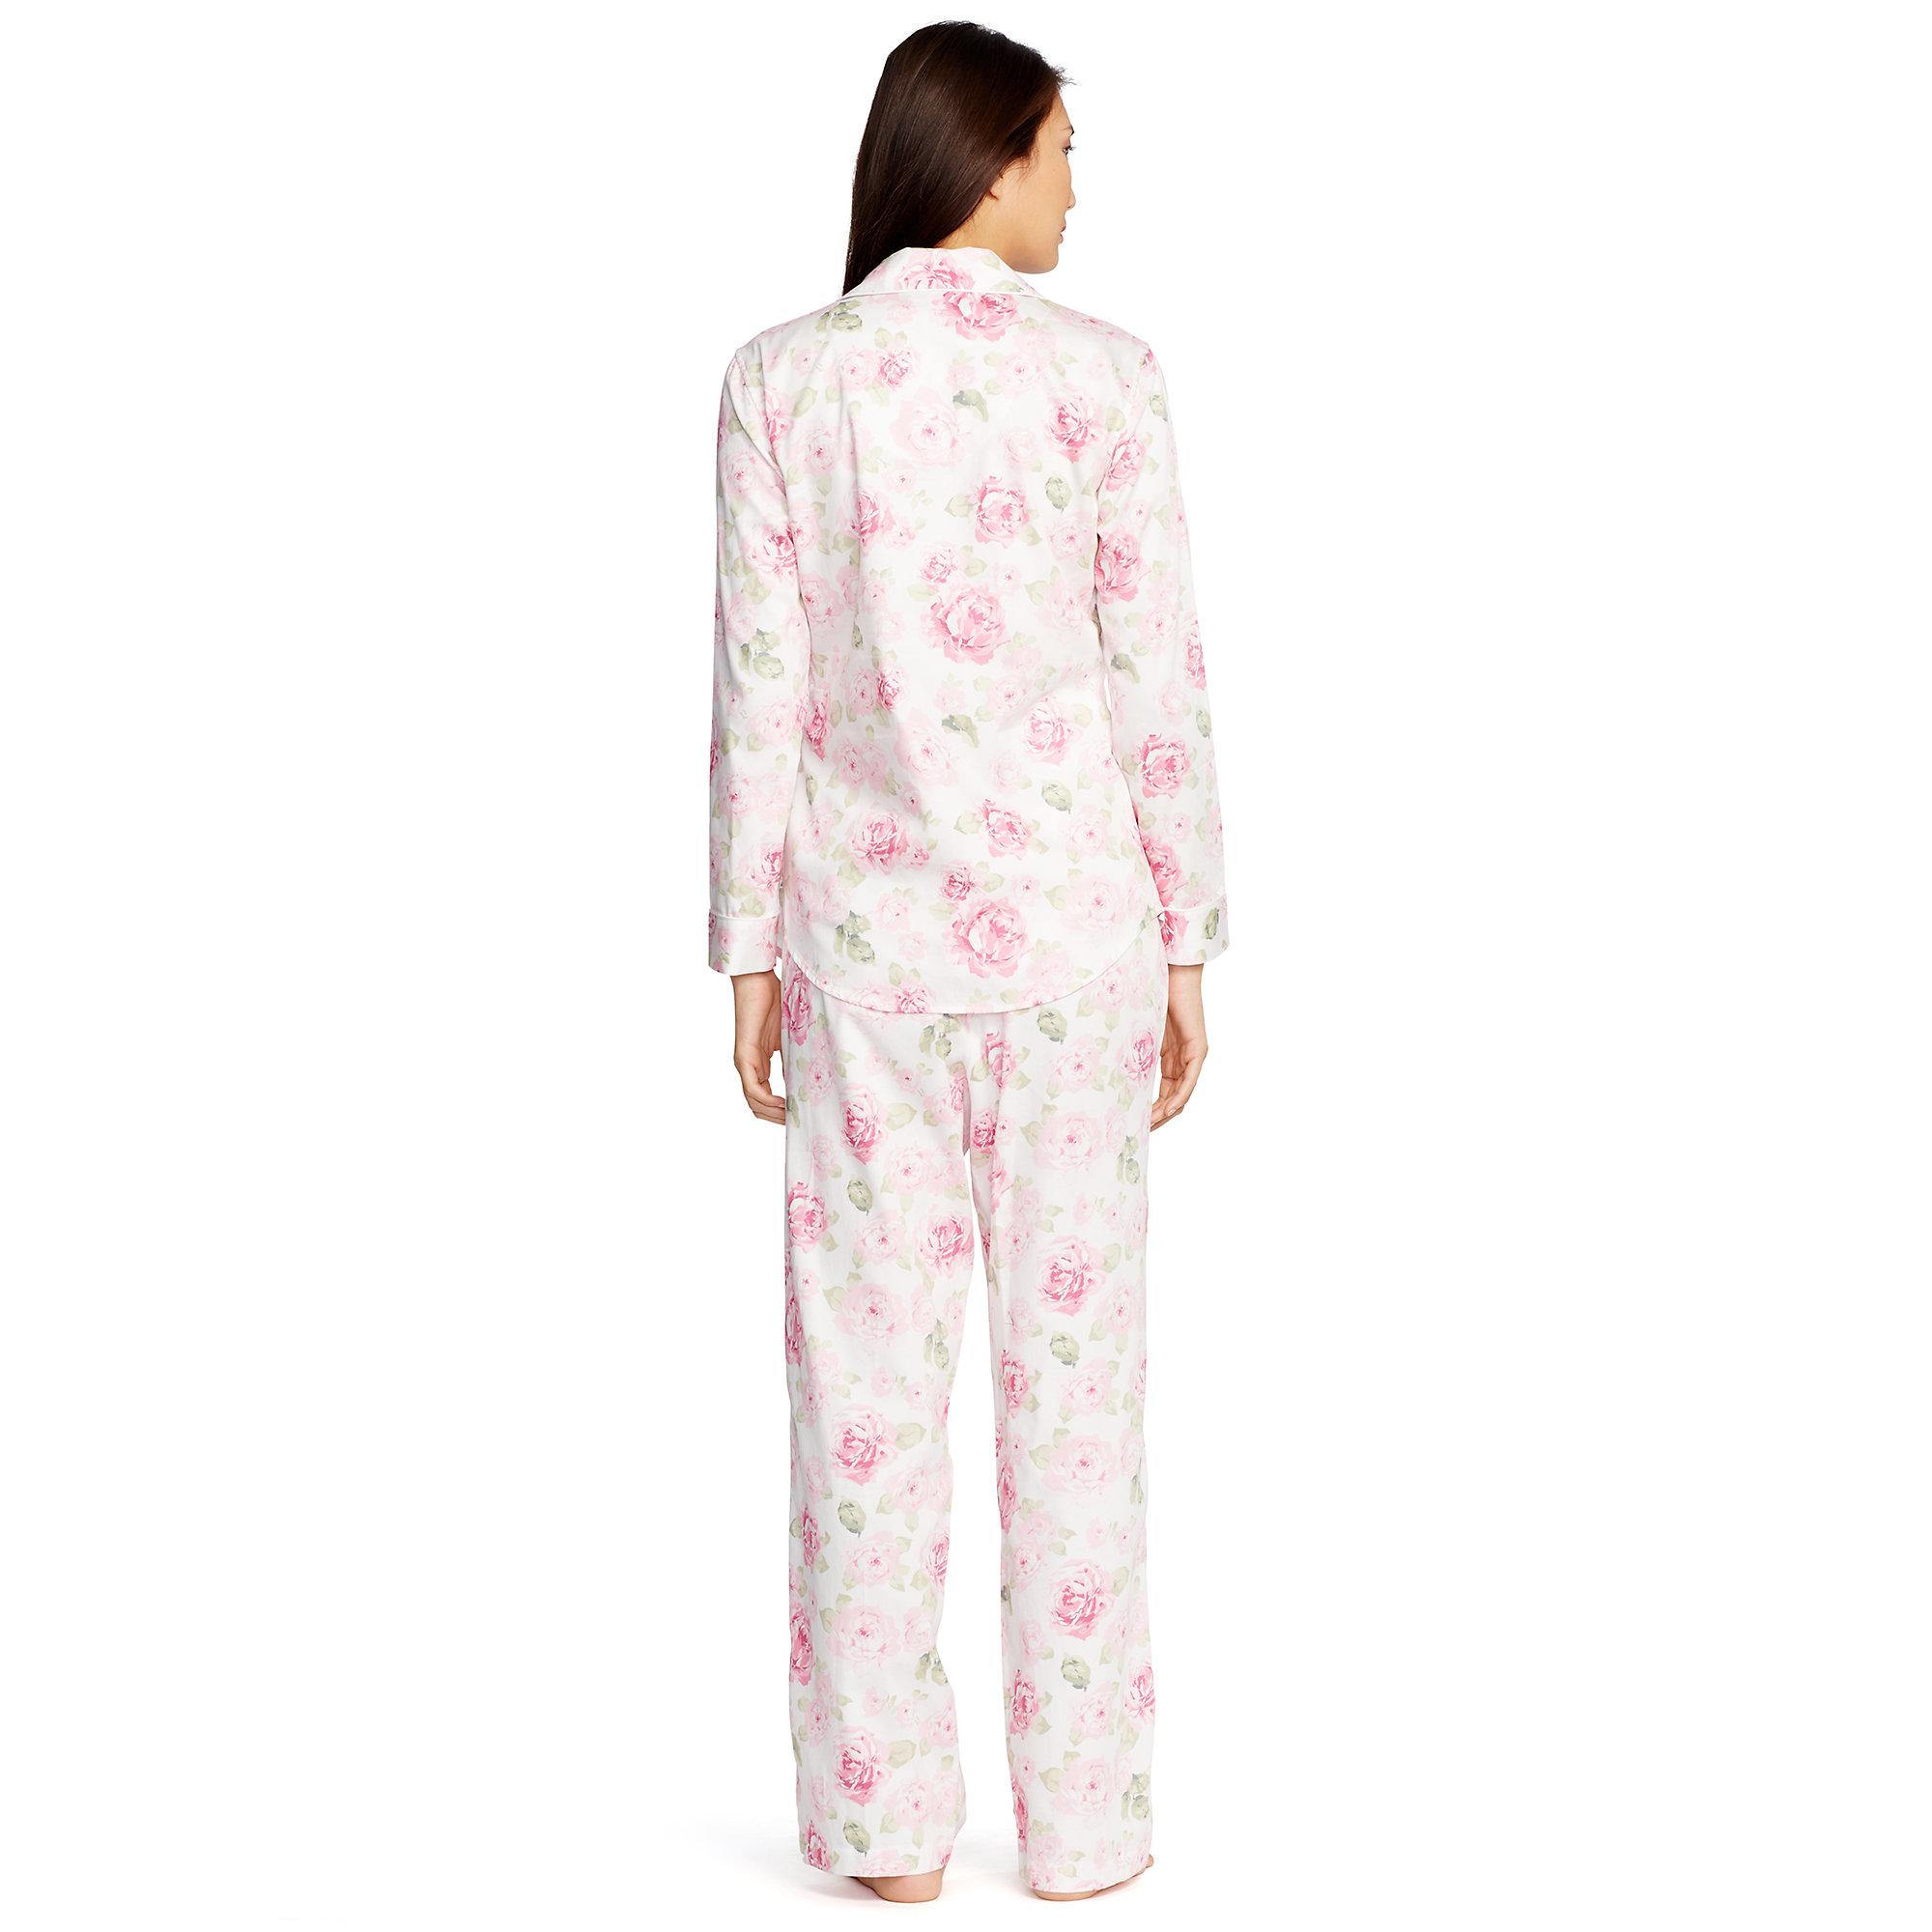 703abbe0b5 Lyst - Ralph Lauren Cotton Sateen Pajama Set in Pink